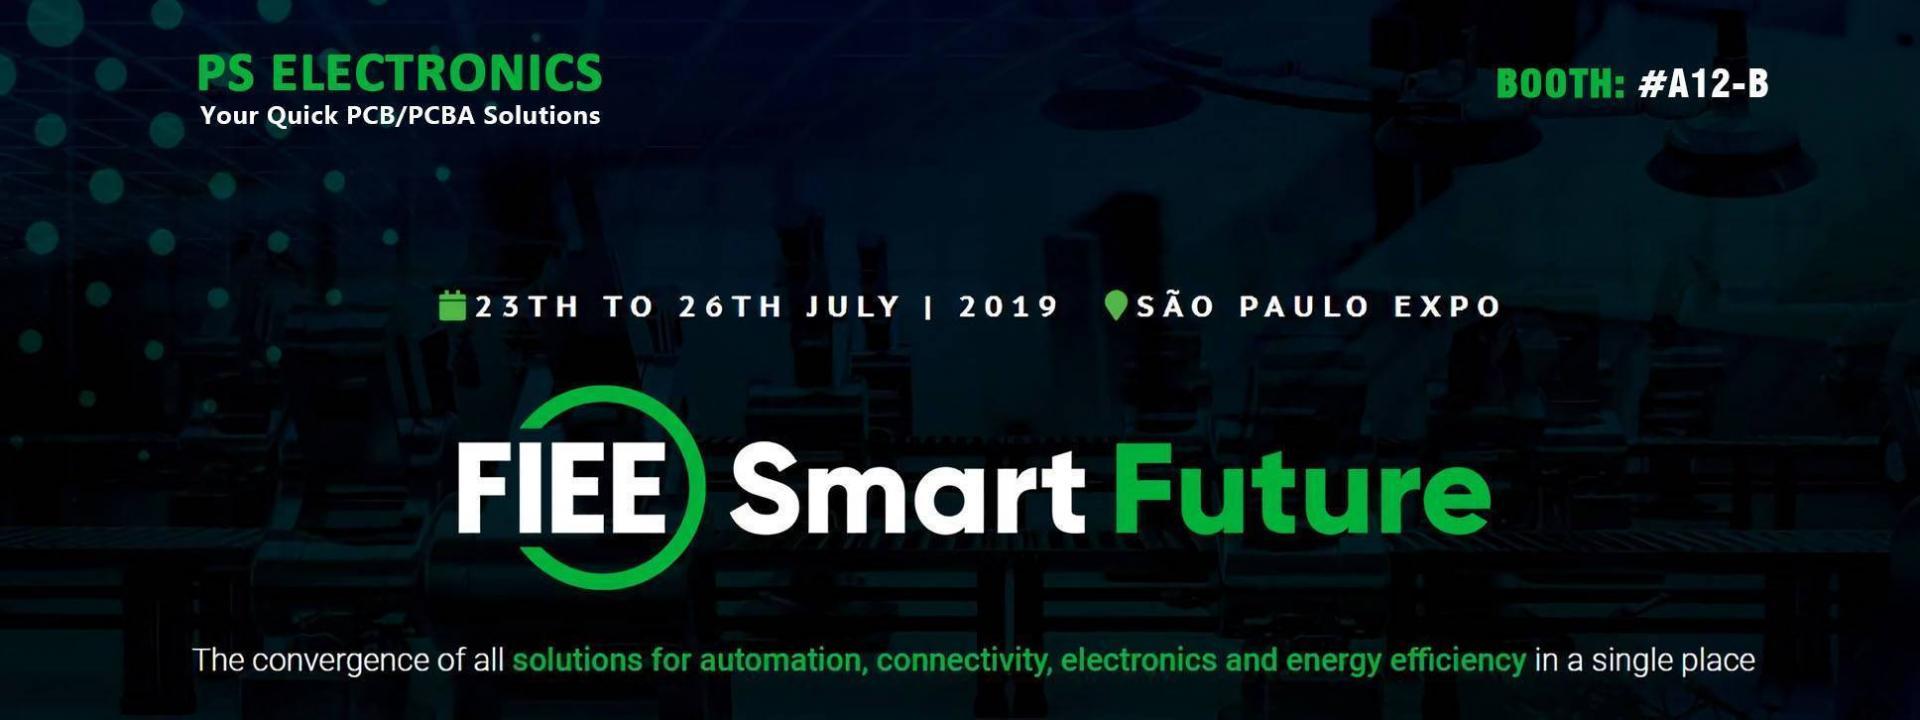 Electronics fair in Brazil 2019 - PS Electronics